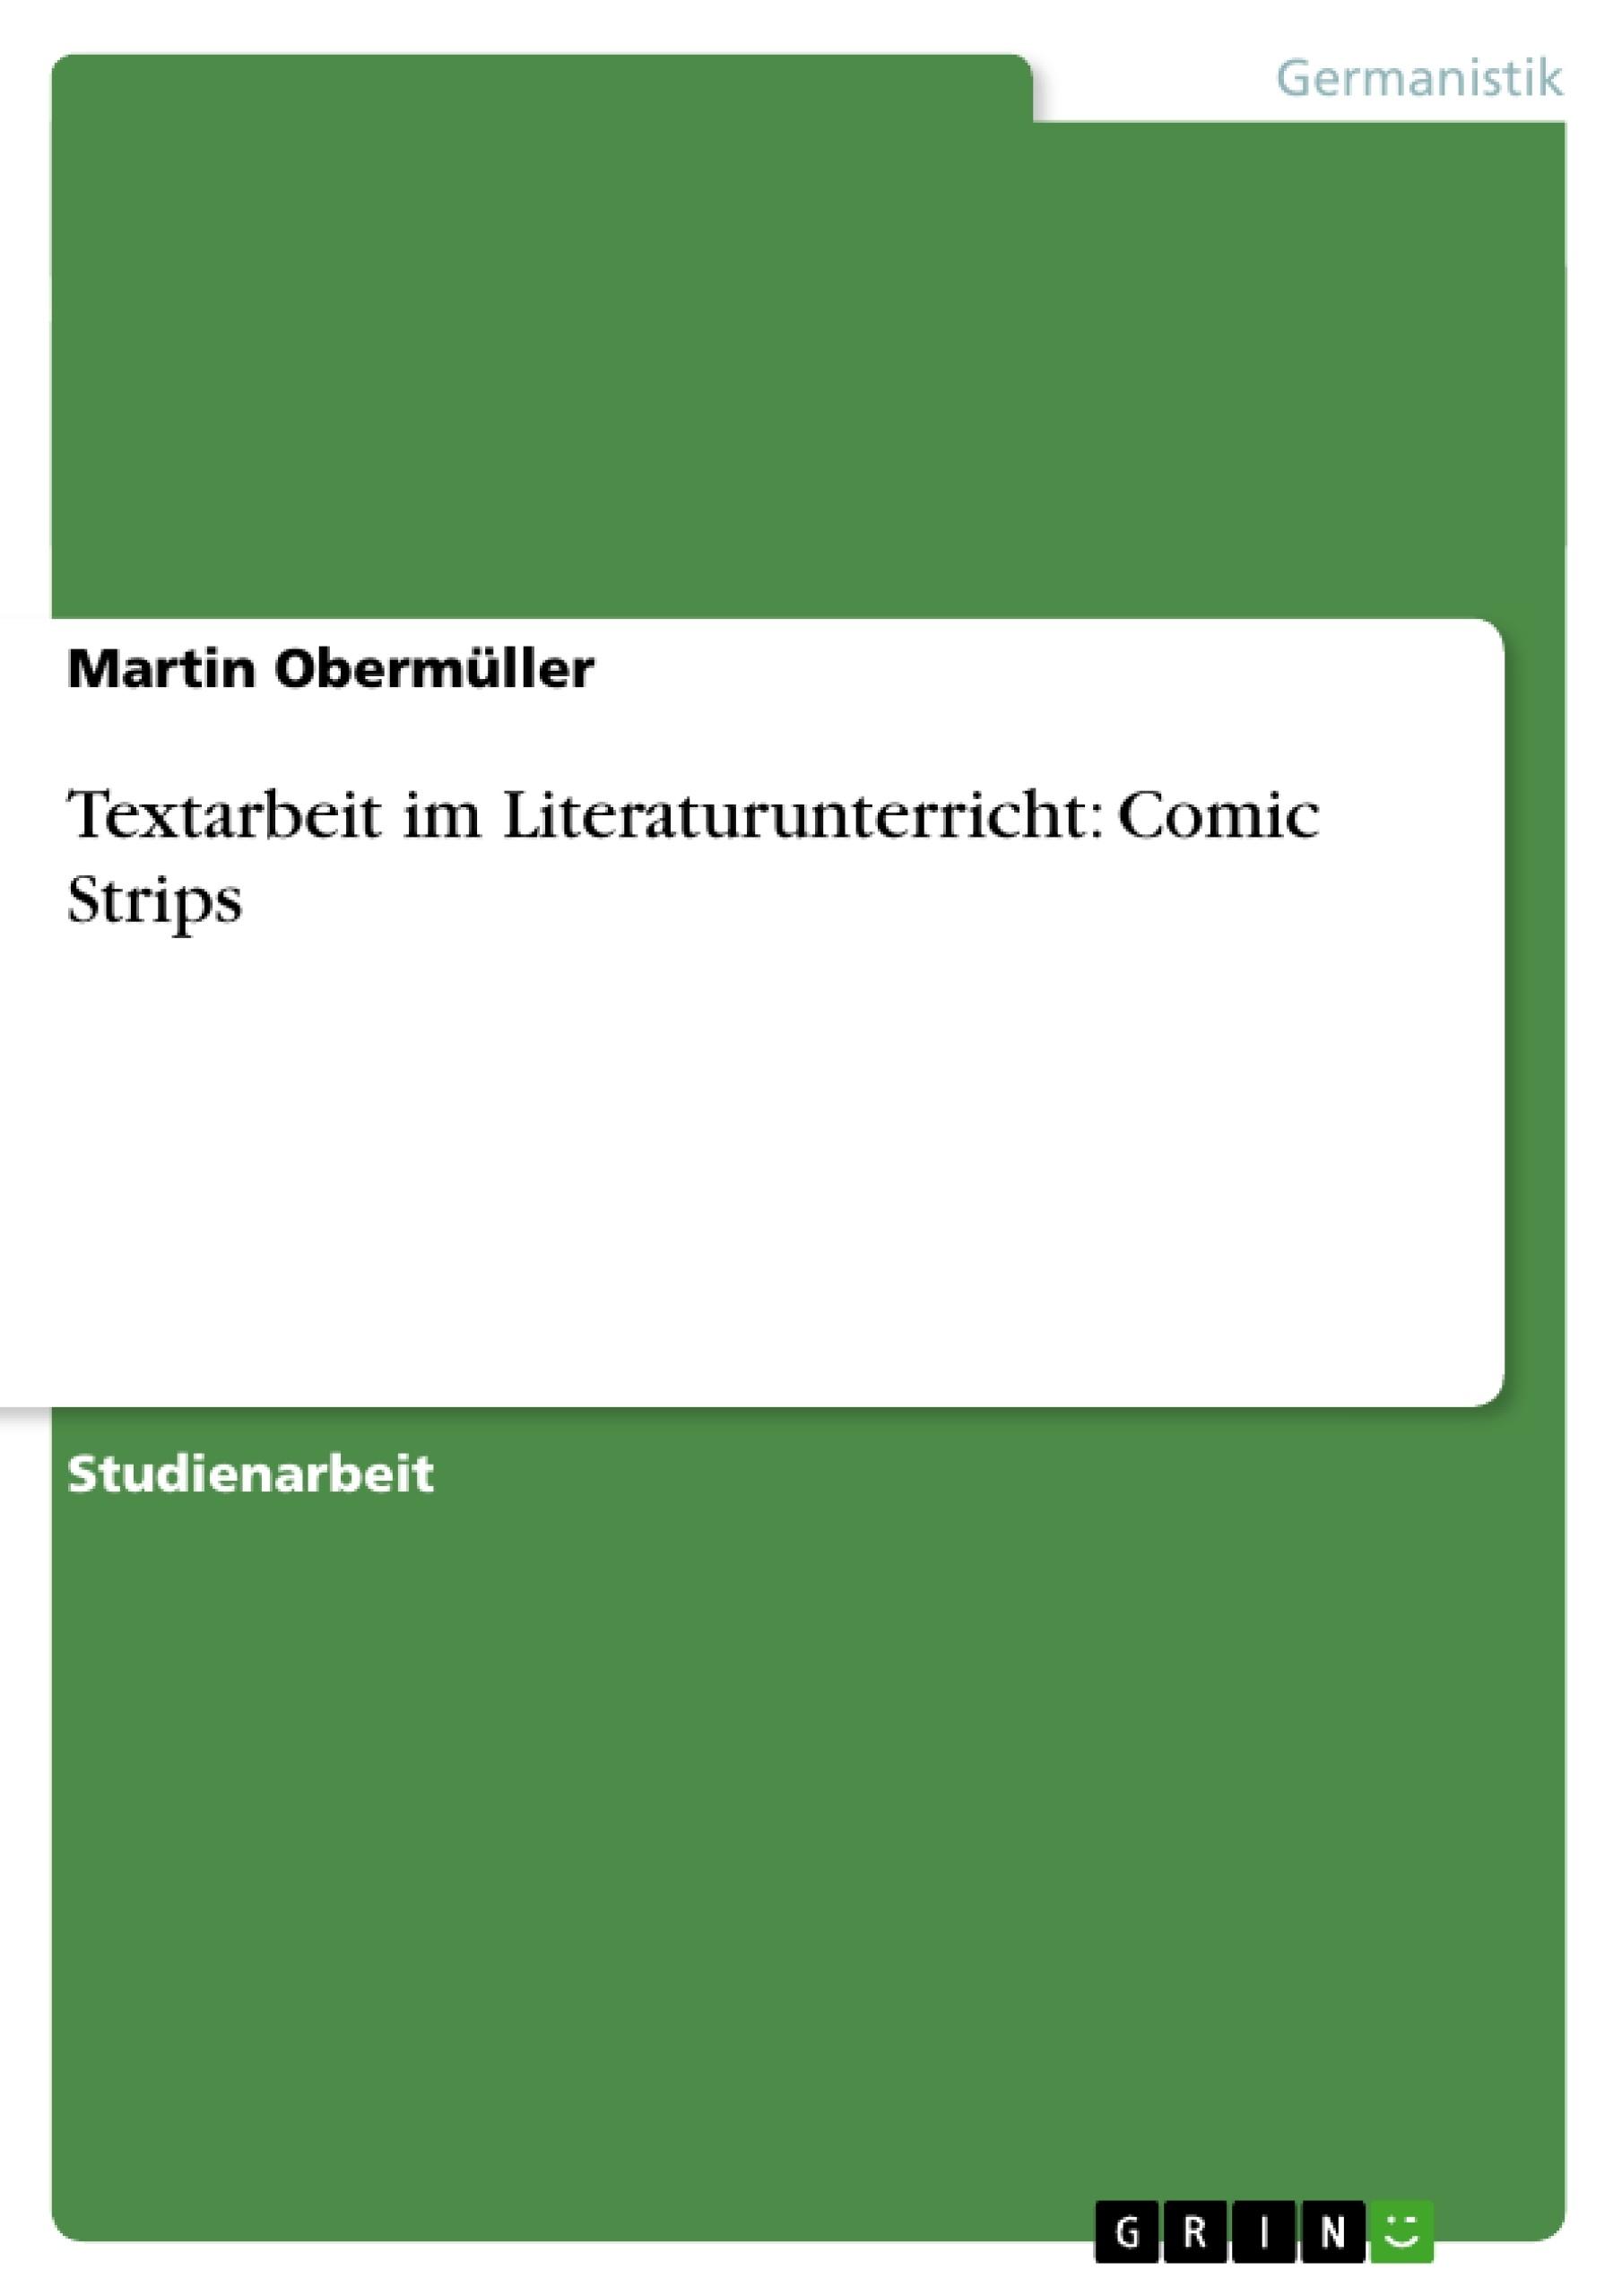 Textarbeit im Literaturunterricht: Comic Strips   Masterarbeit ...